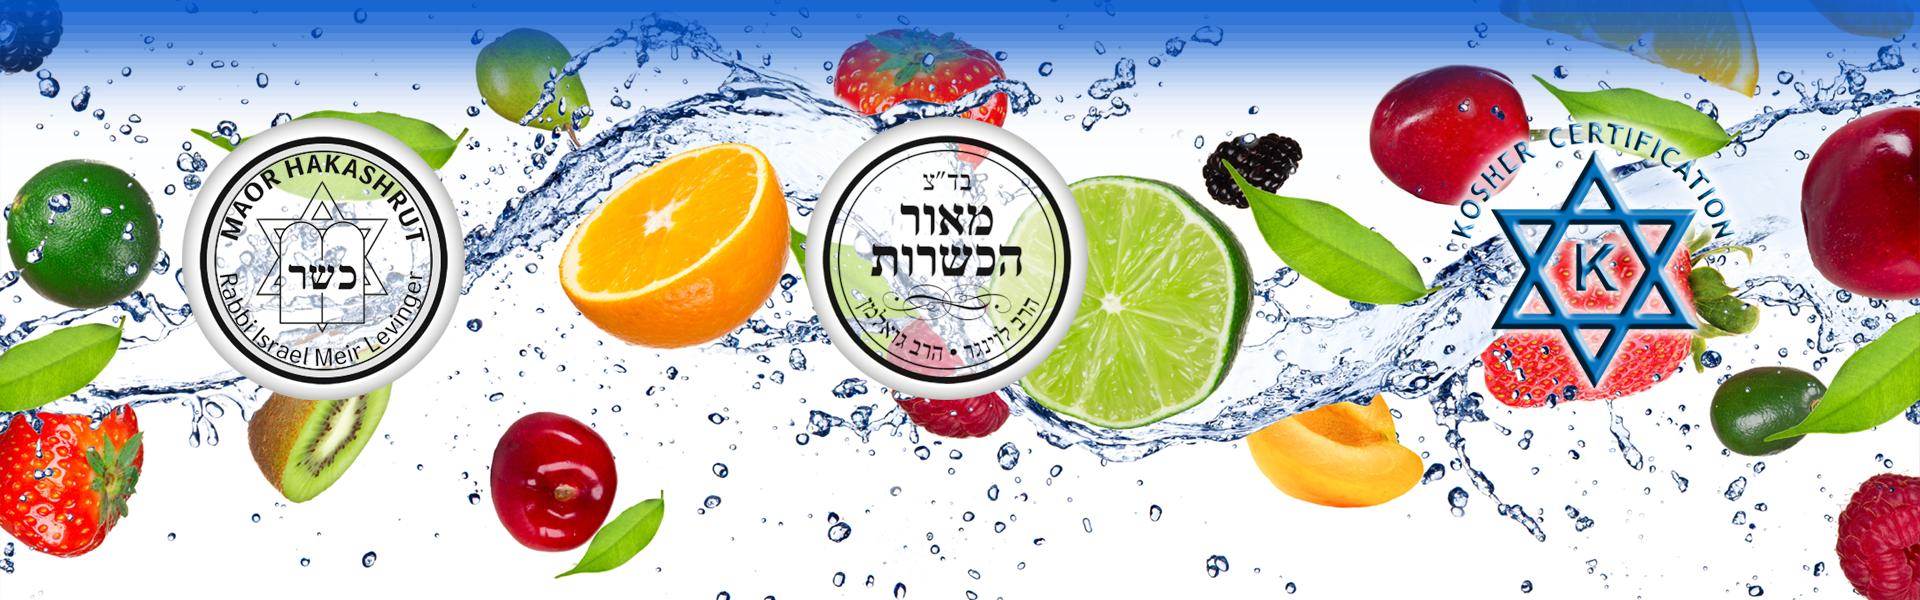 site- ul de potrivire kosher)